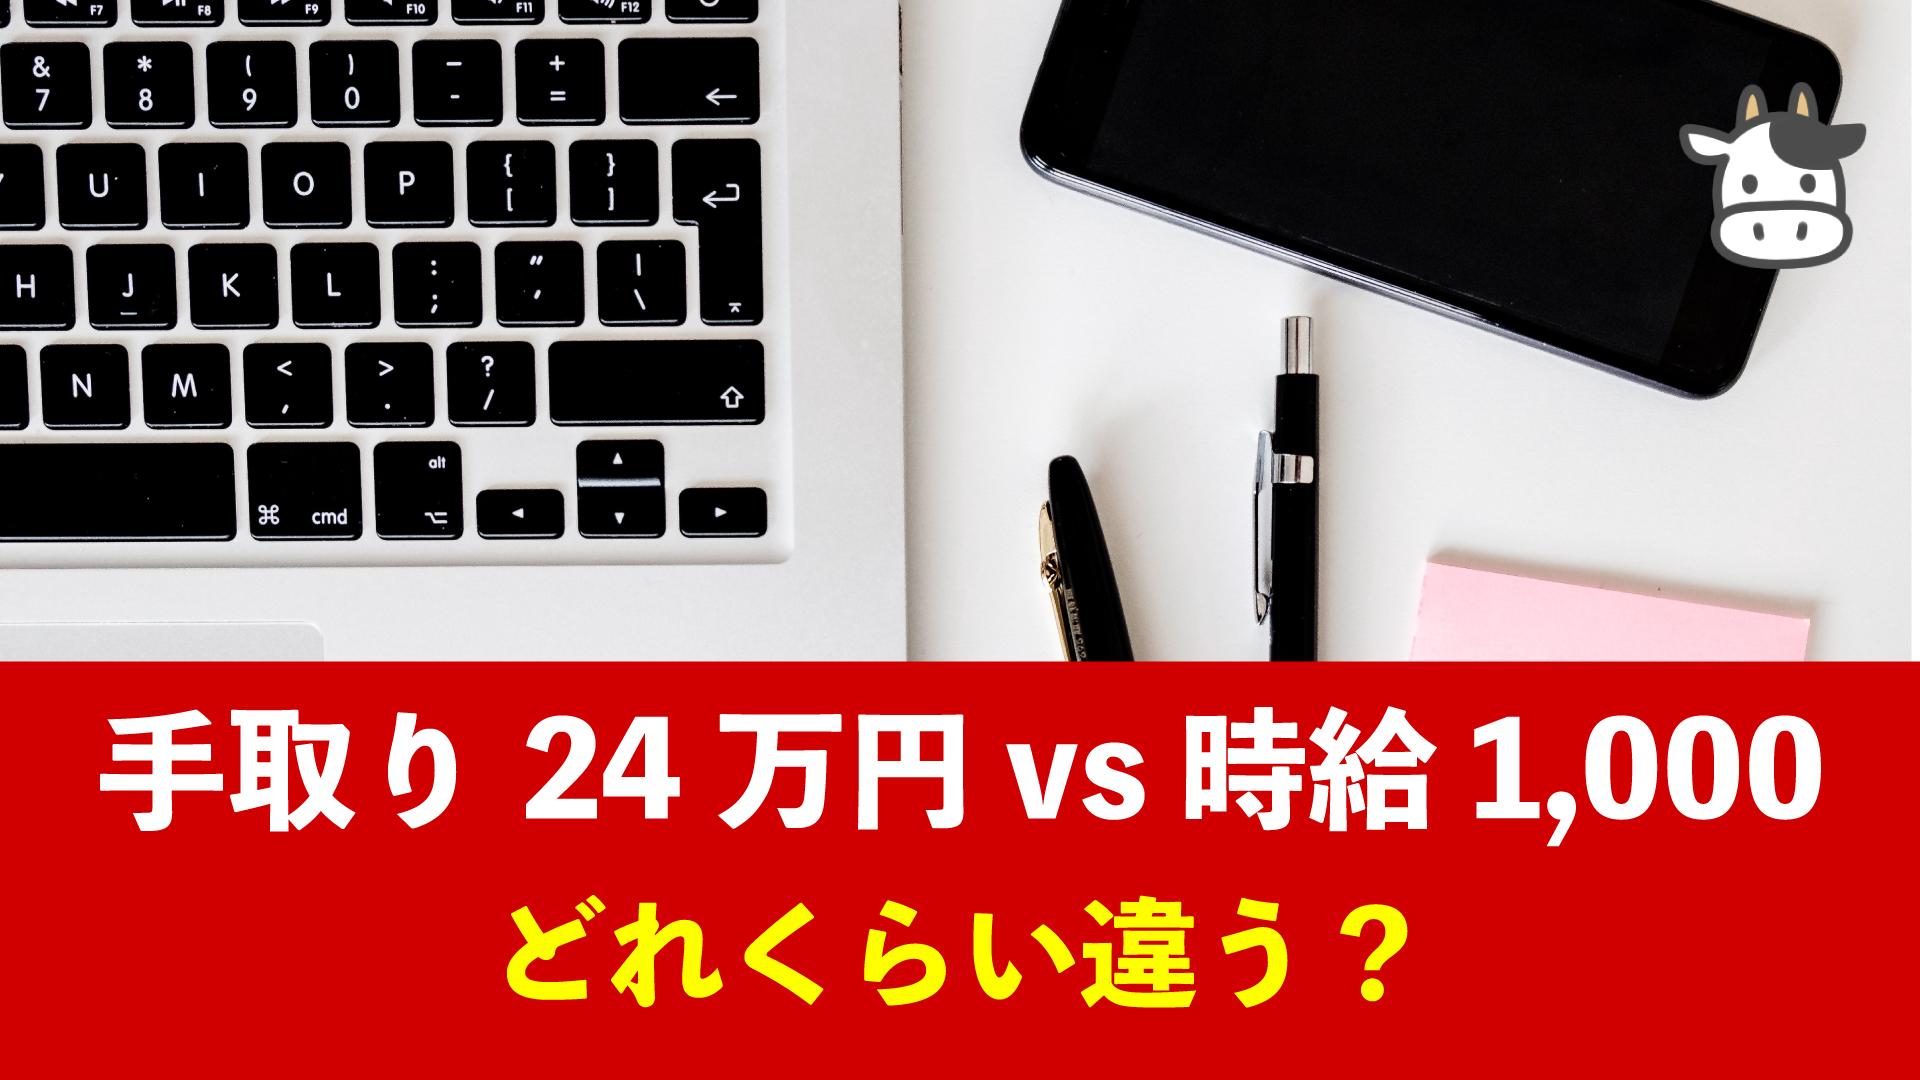 手取り24万円 vs 時給1,000円